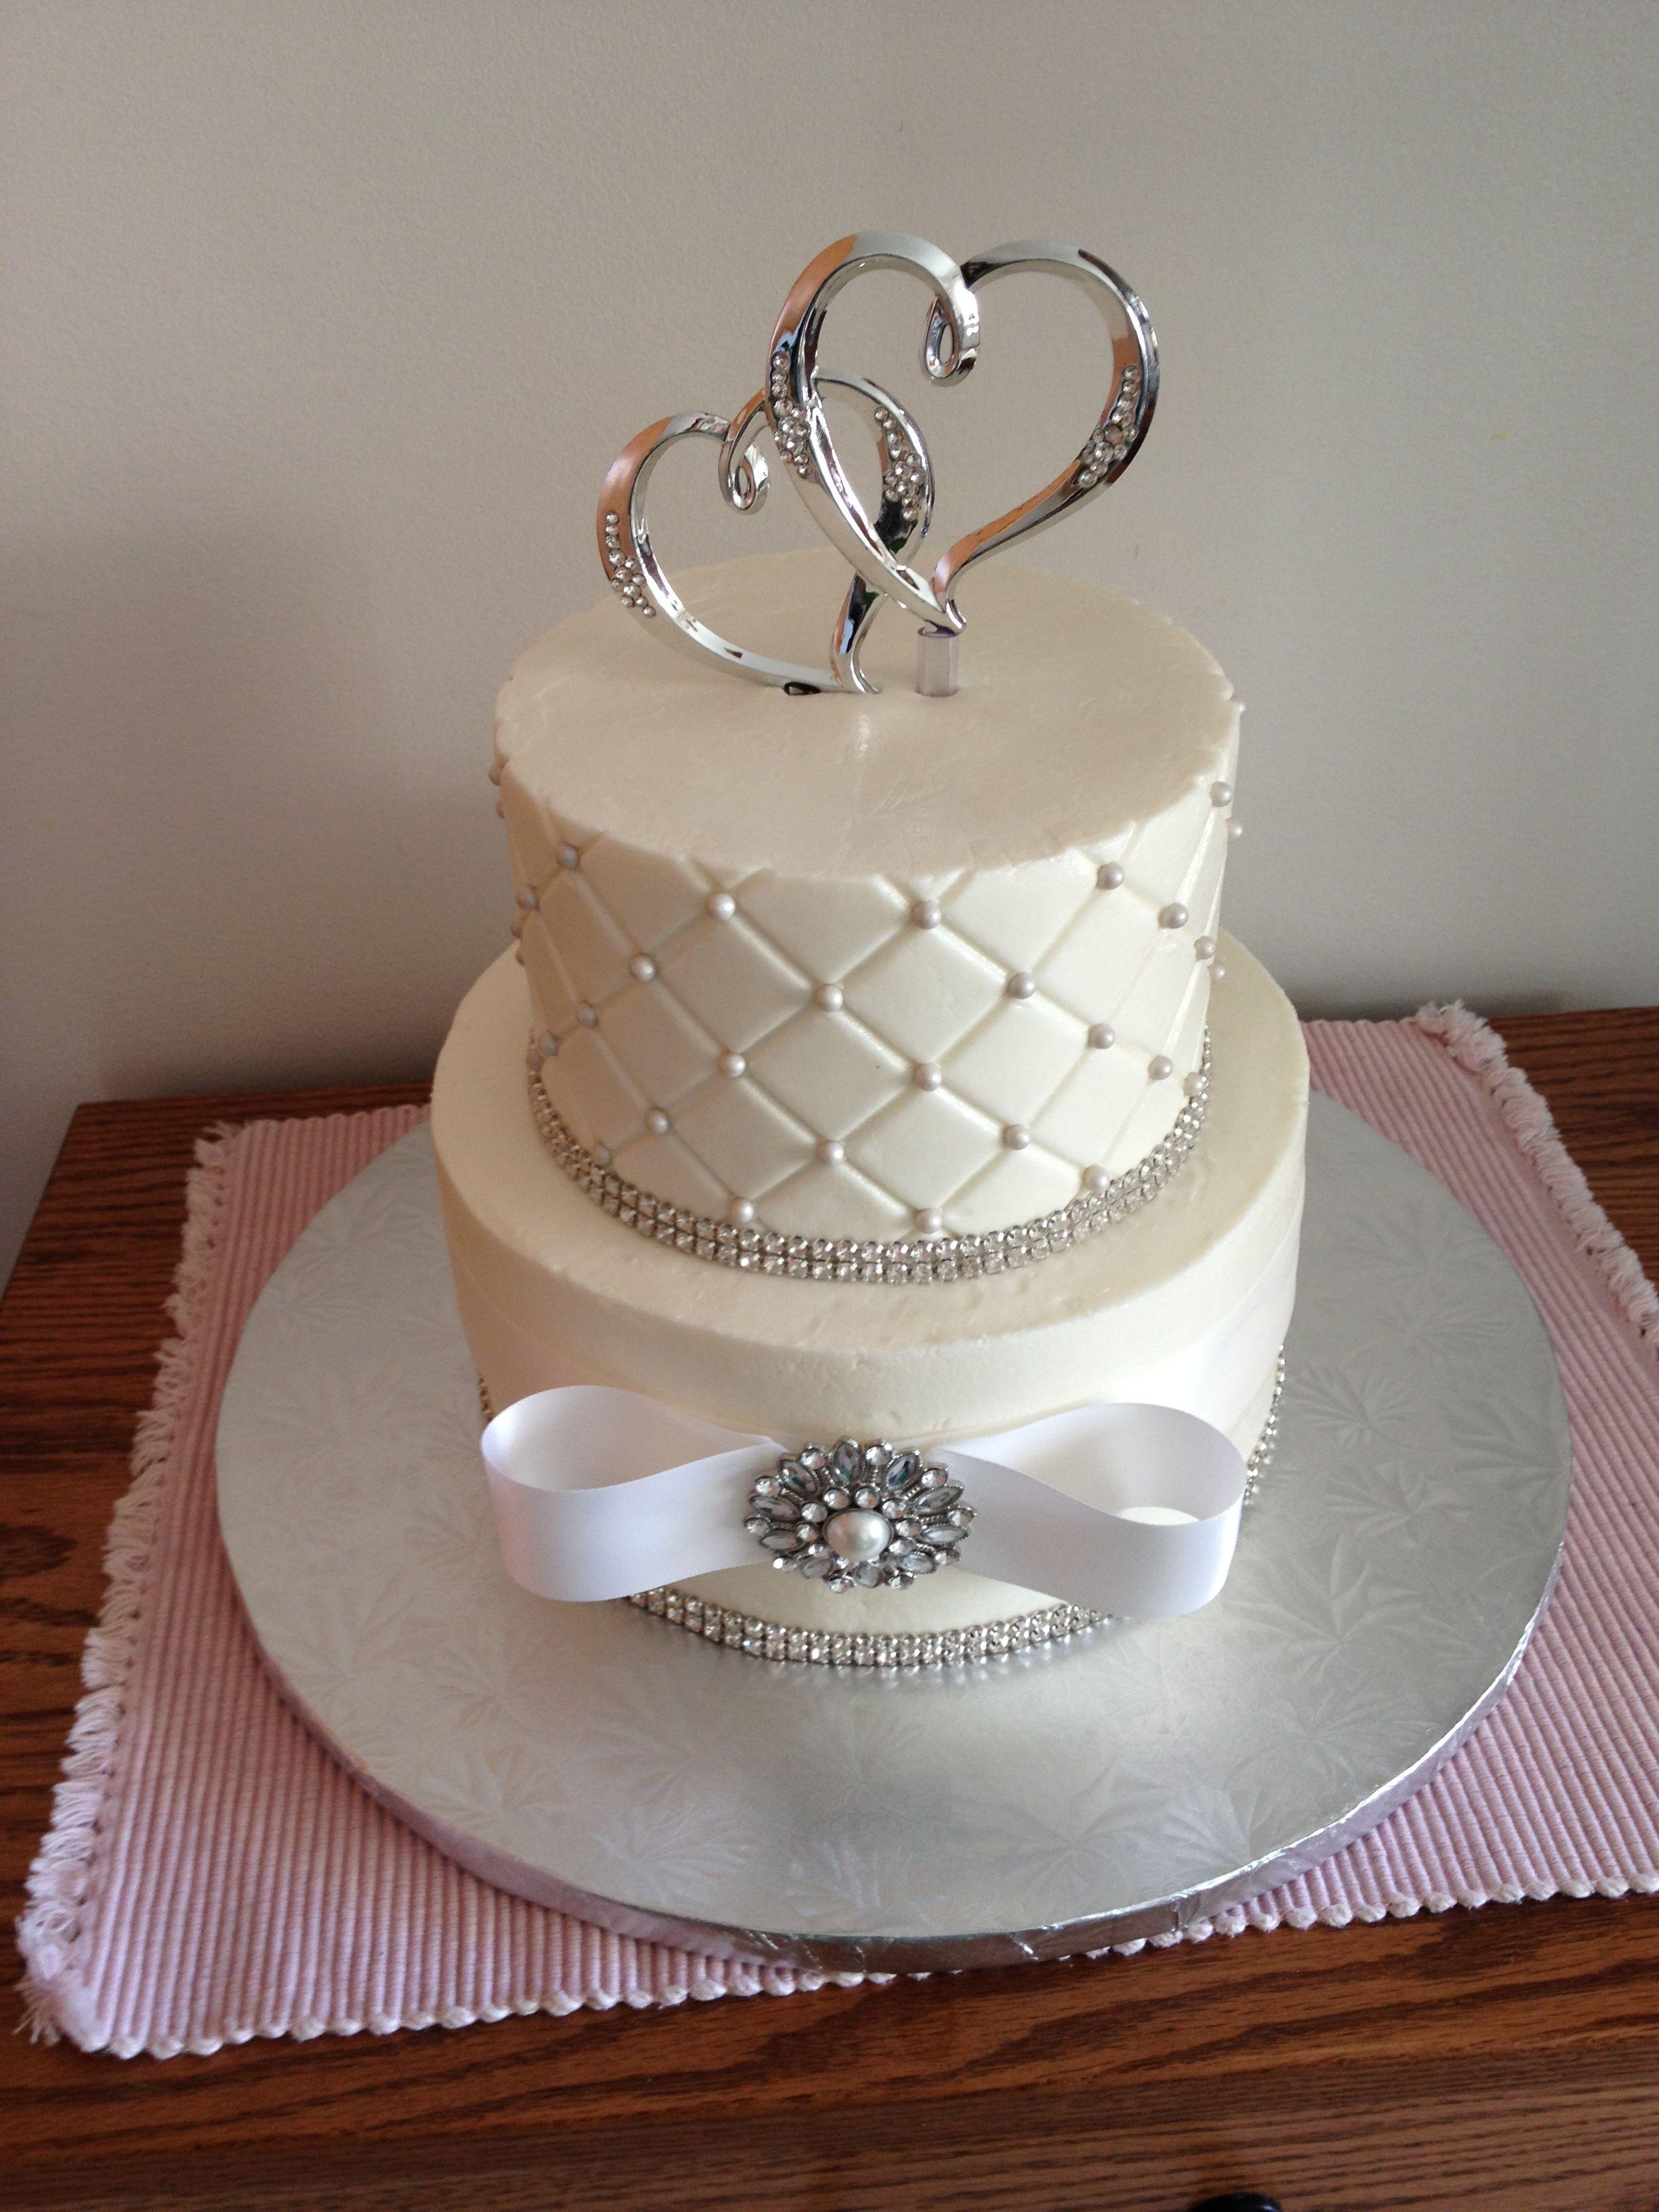 Homemade Anniversary Cakes Small Wedding Cake